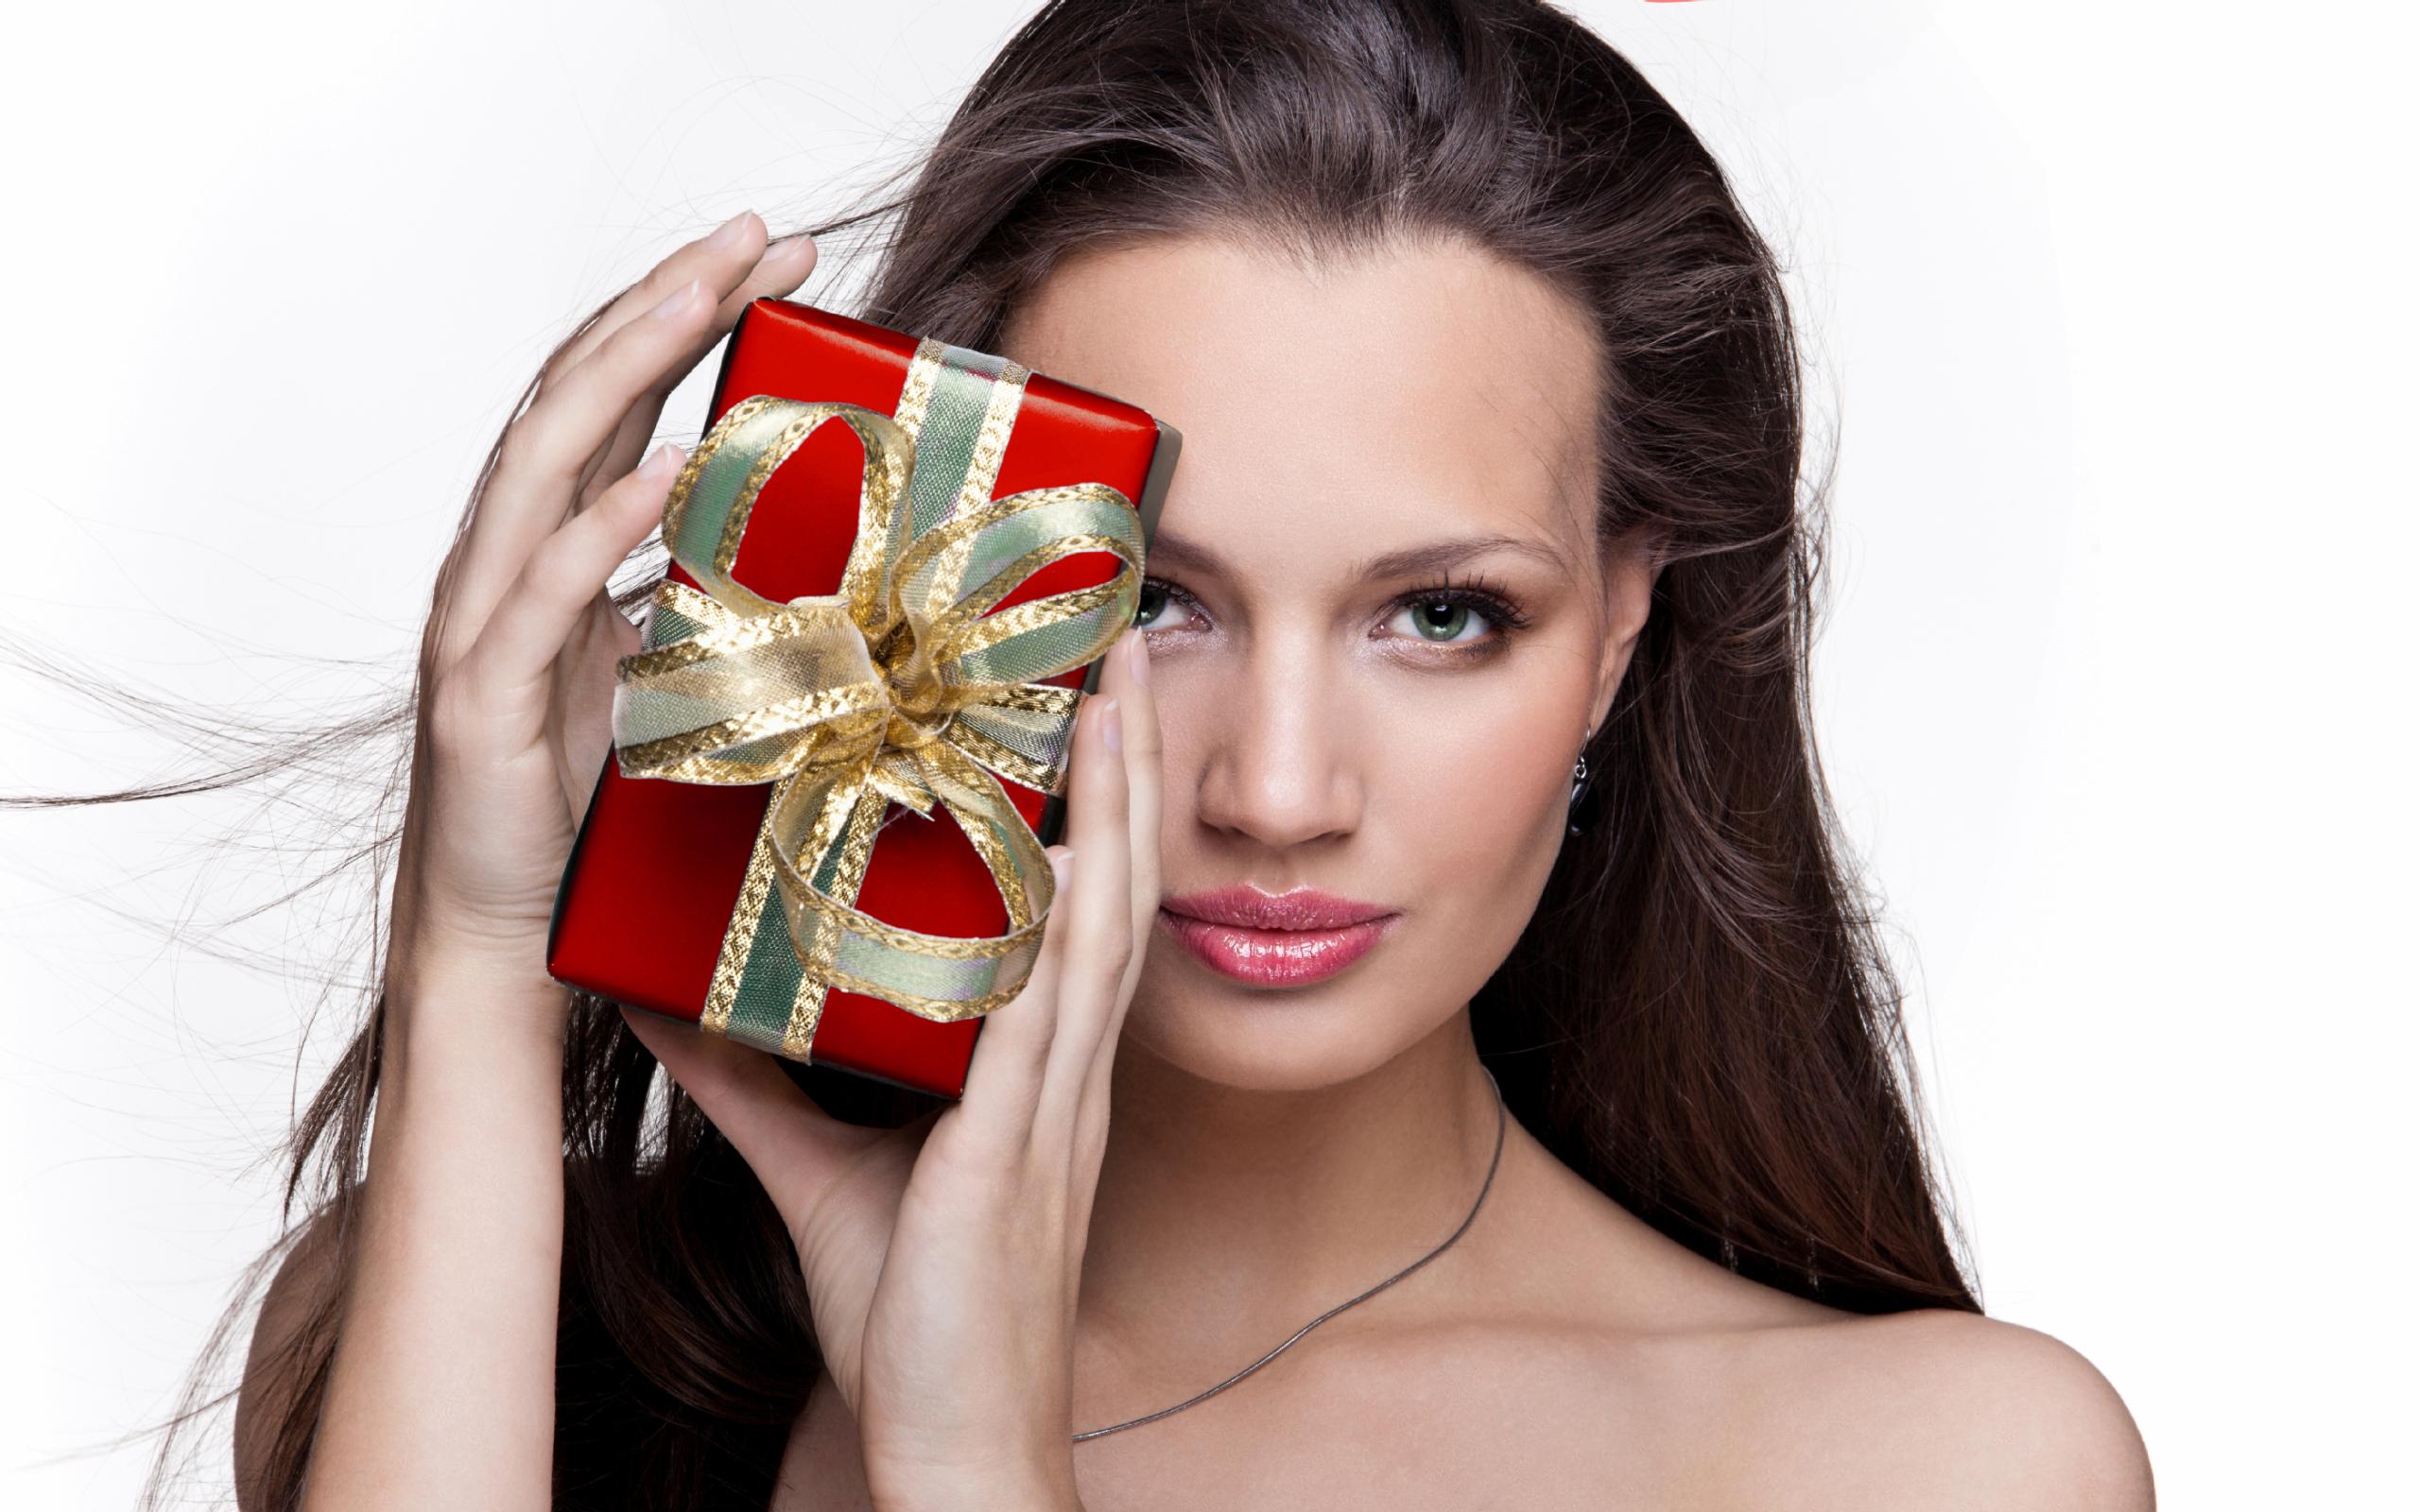 Подарок девушке: фото и изображения подарок девушке 21